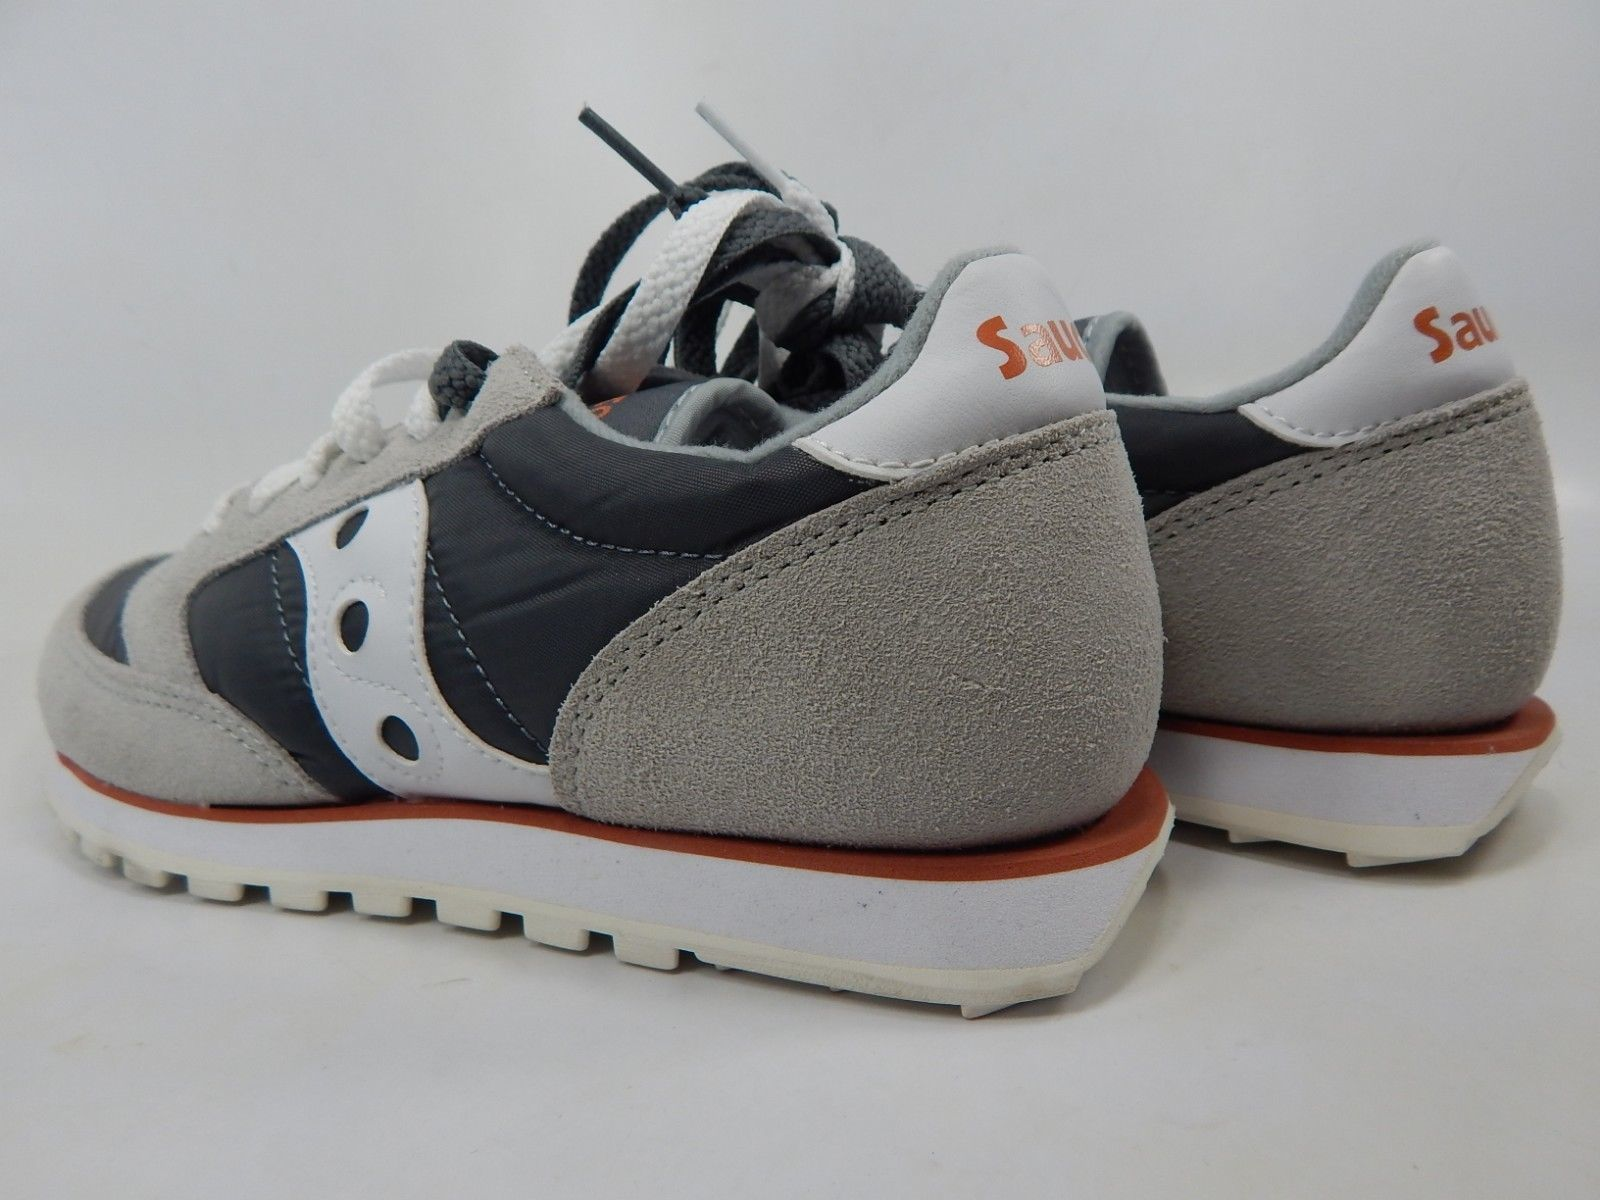 Saucony Jazz Low Pro Original S1866-247 Women's Running Shoes Size 7 M (B) EU 38